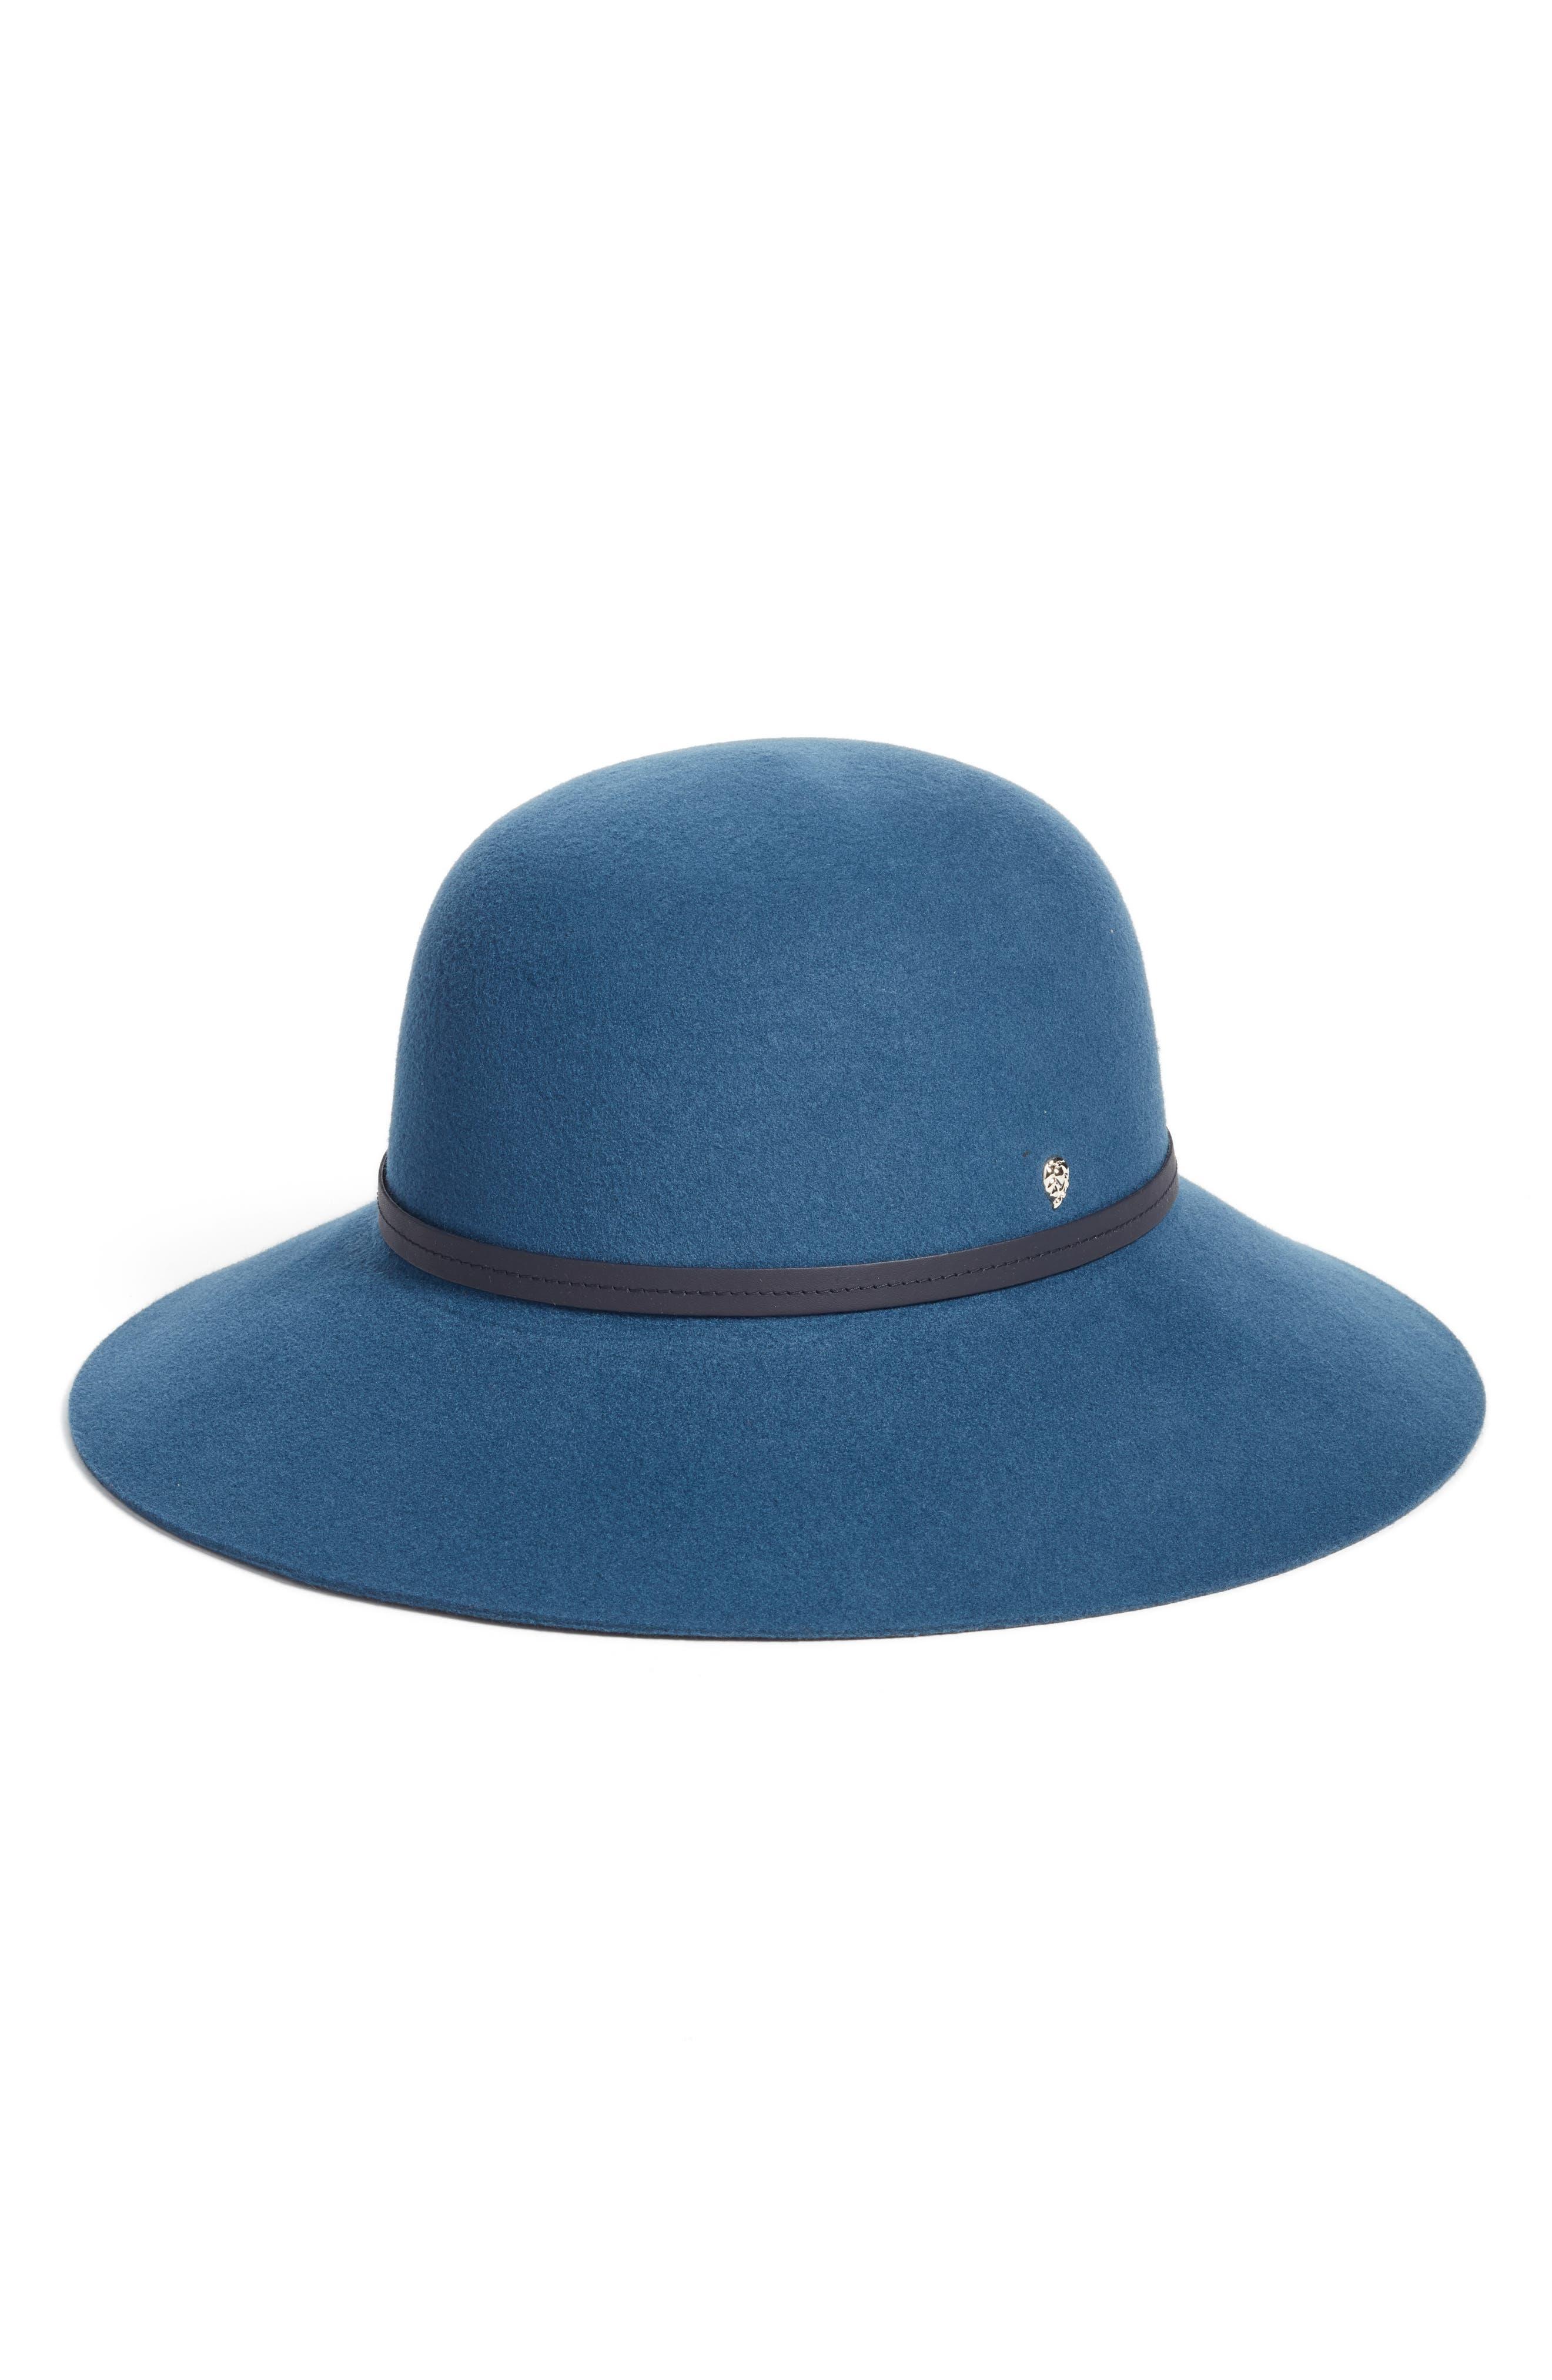 Main Image - Helen Kaminski Angled Brim Wool Felt Hat